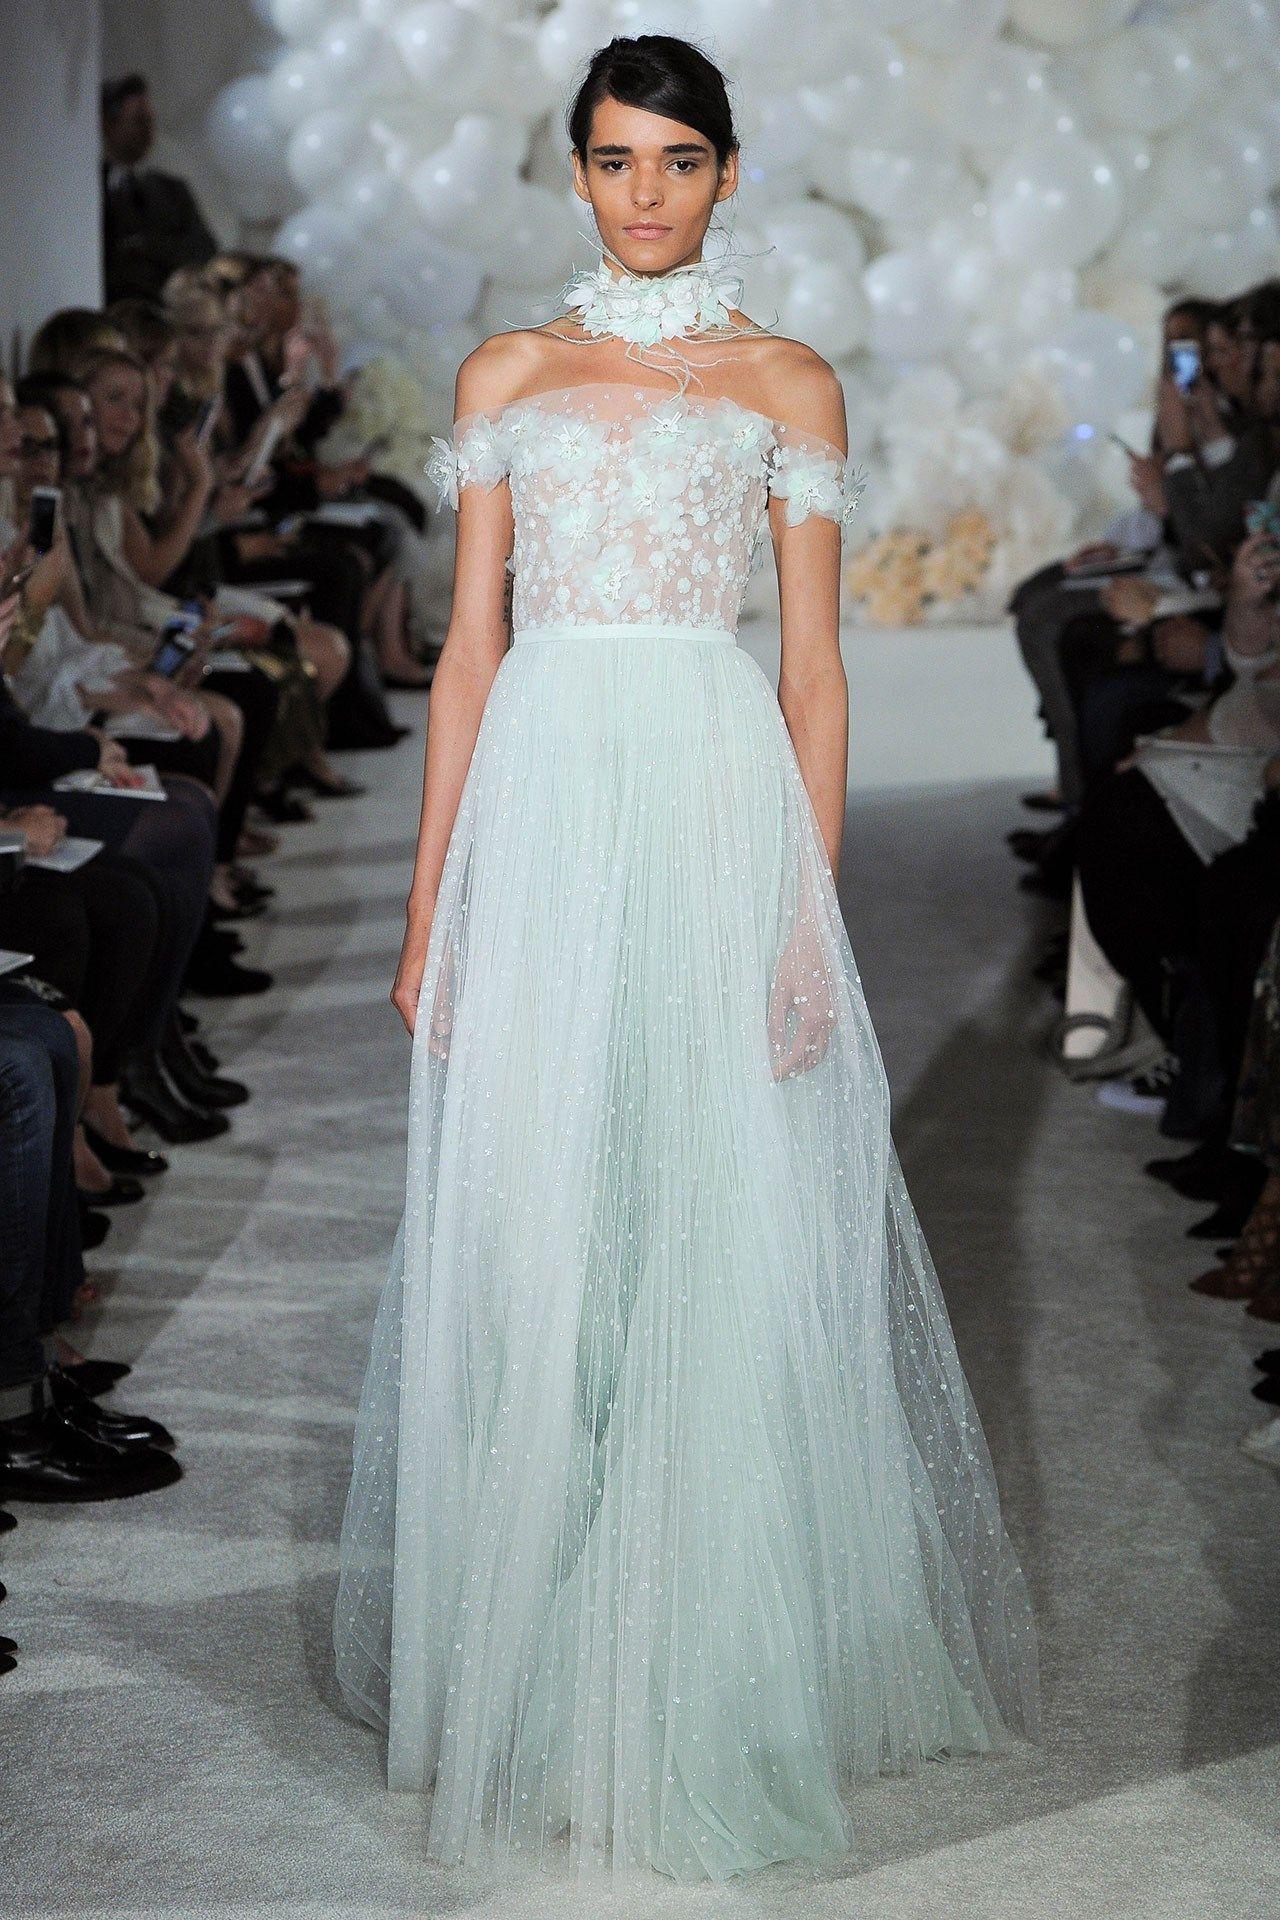 Wedding Dress Trends That Will Be Huge In 2018 | Wedding dress ...